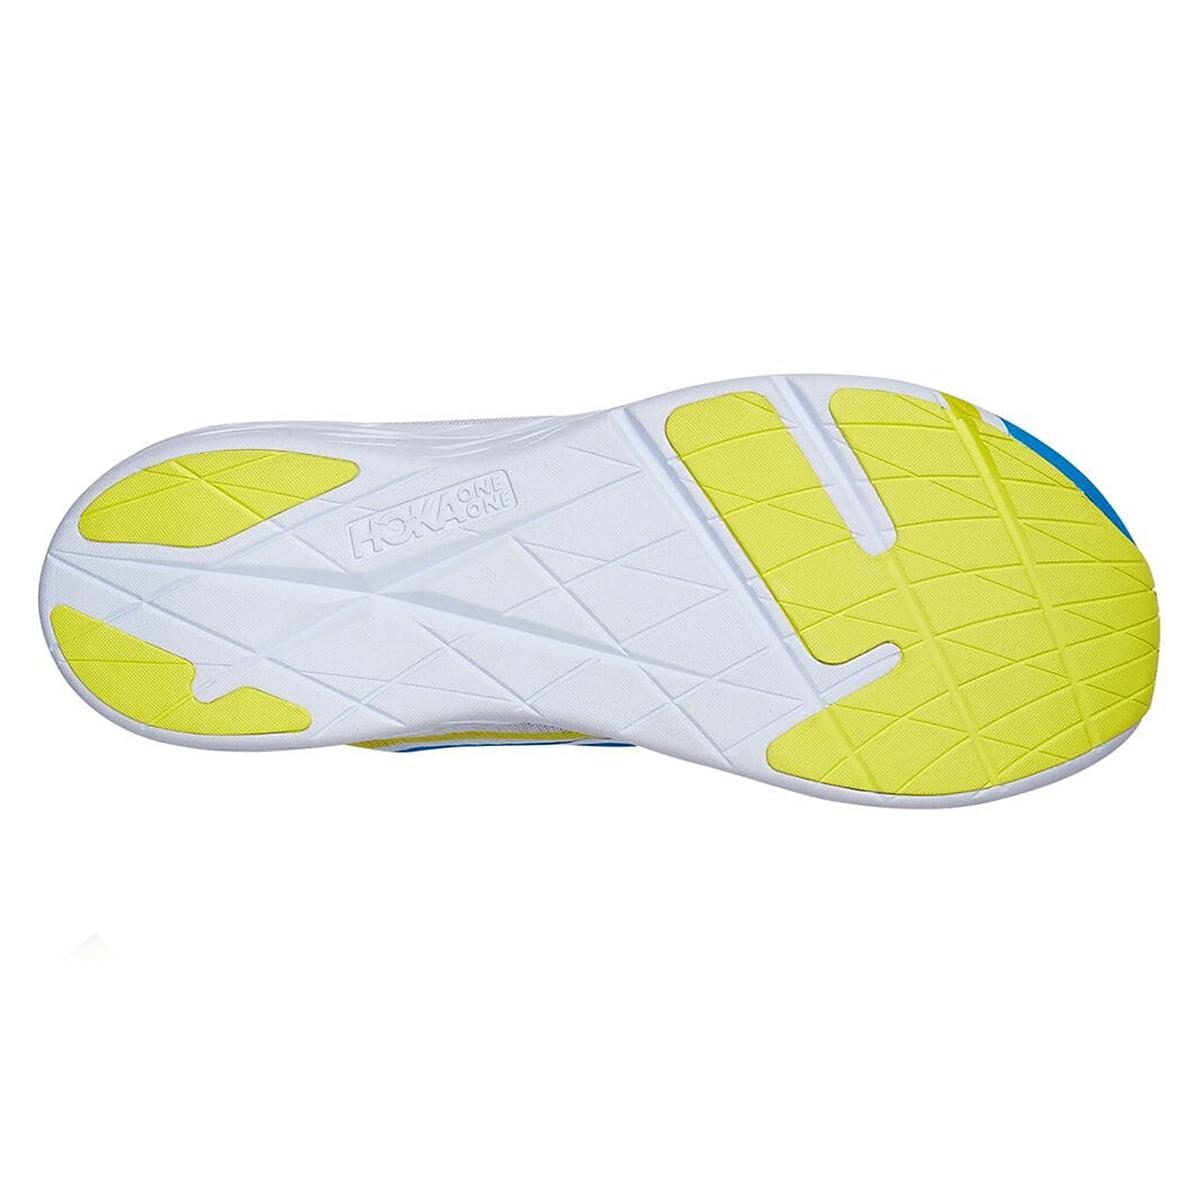 Hoka One One Rocket X Running Shoe - Color: White/Diva Blue - Size: M5/W6 - Width: Regular, White/Diva Blue, large, image 4